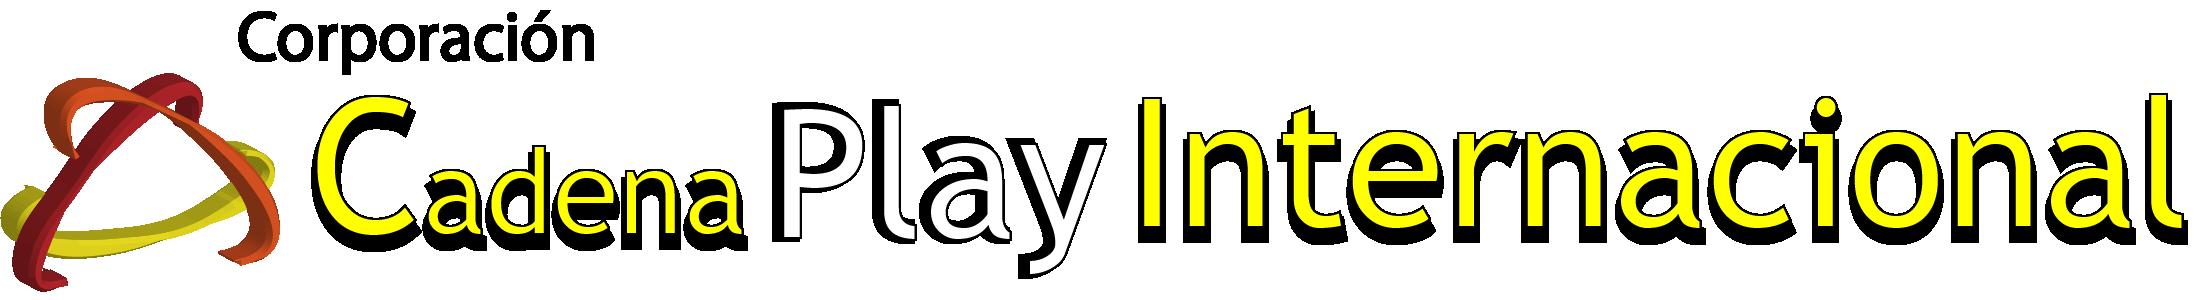 Cadena Play Internacional